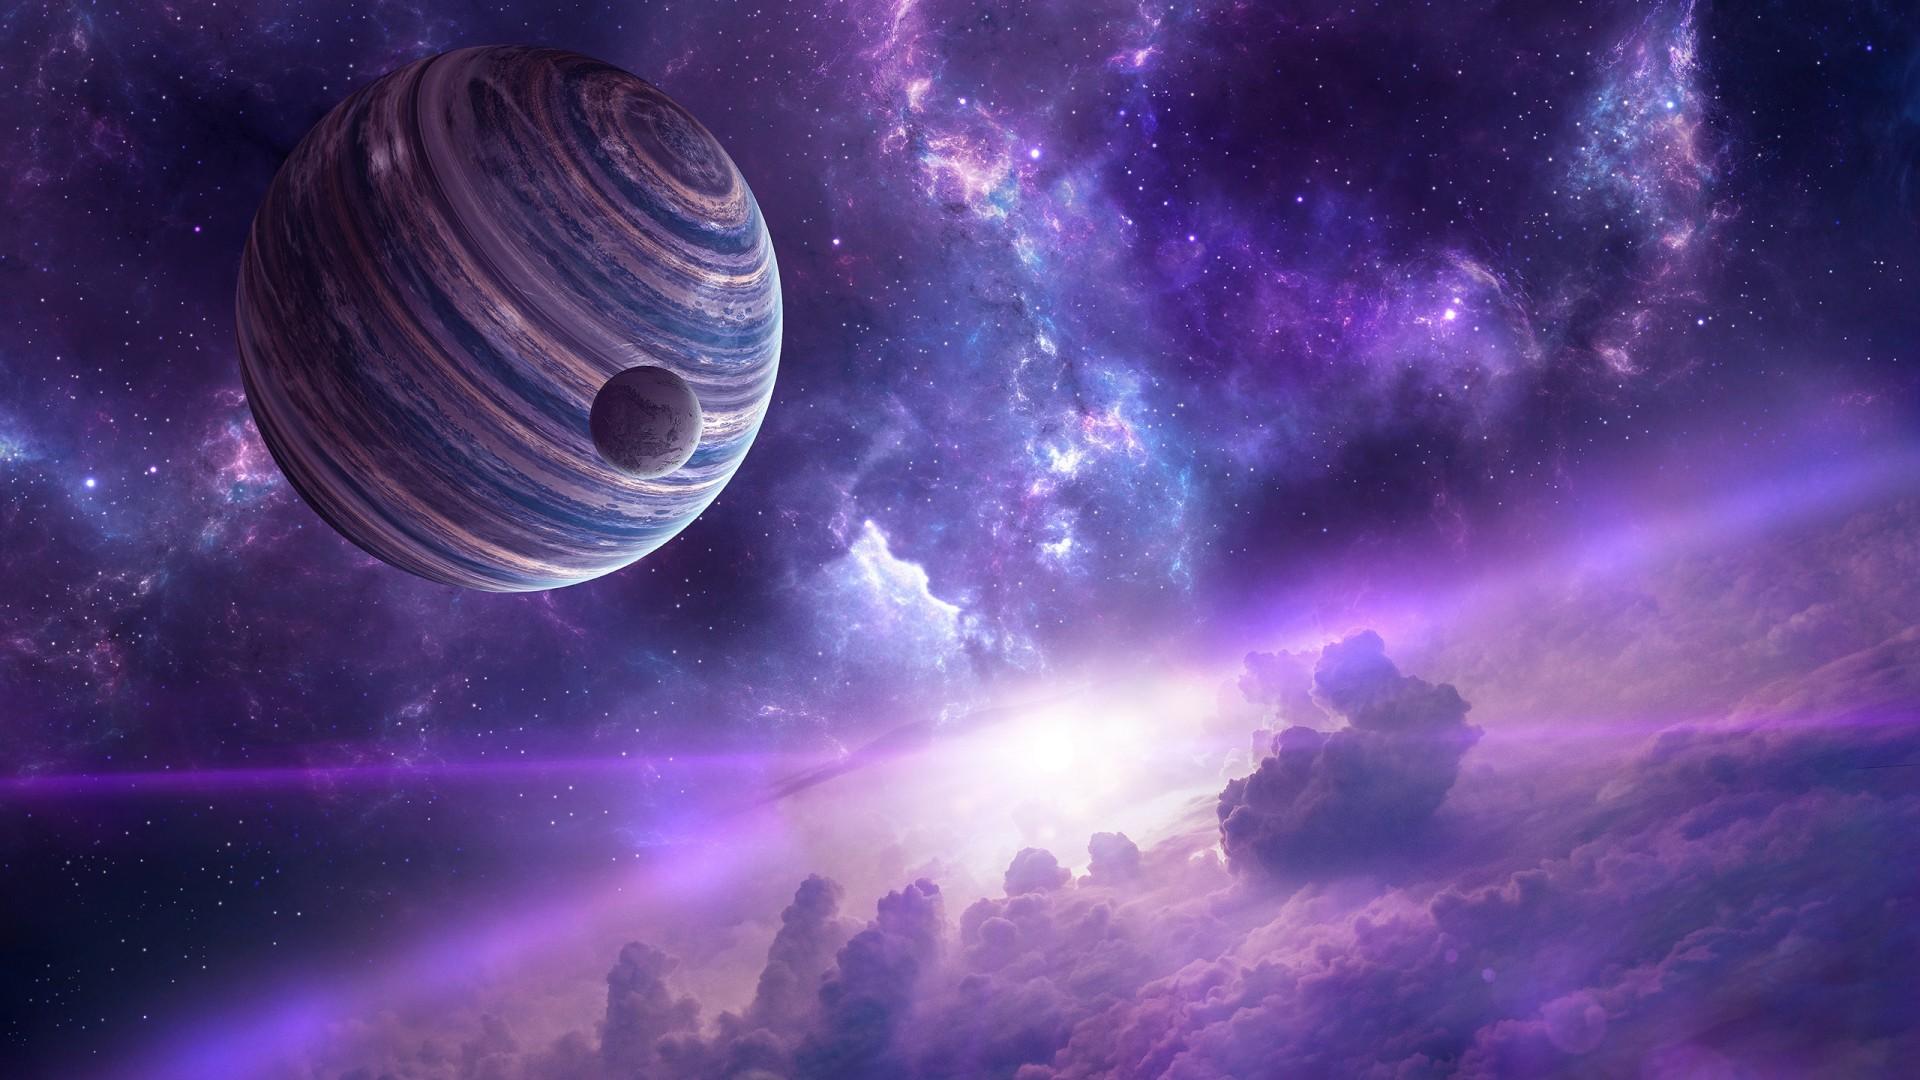 Earth 3d Wallpaper Windows Nebula Planets Wallpapers Hd Wallpapers Id 20359